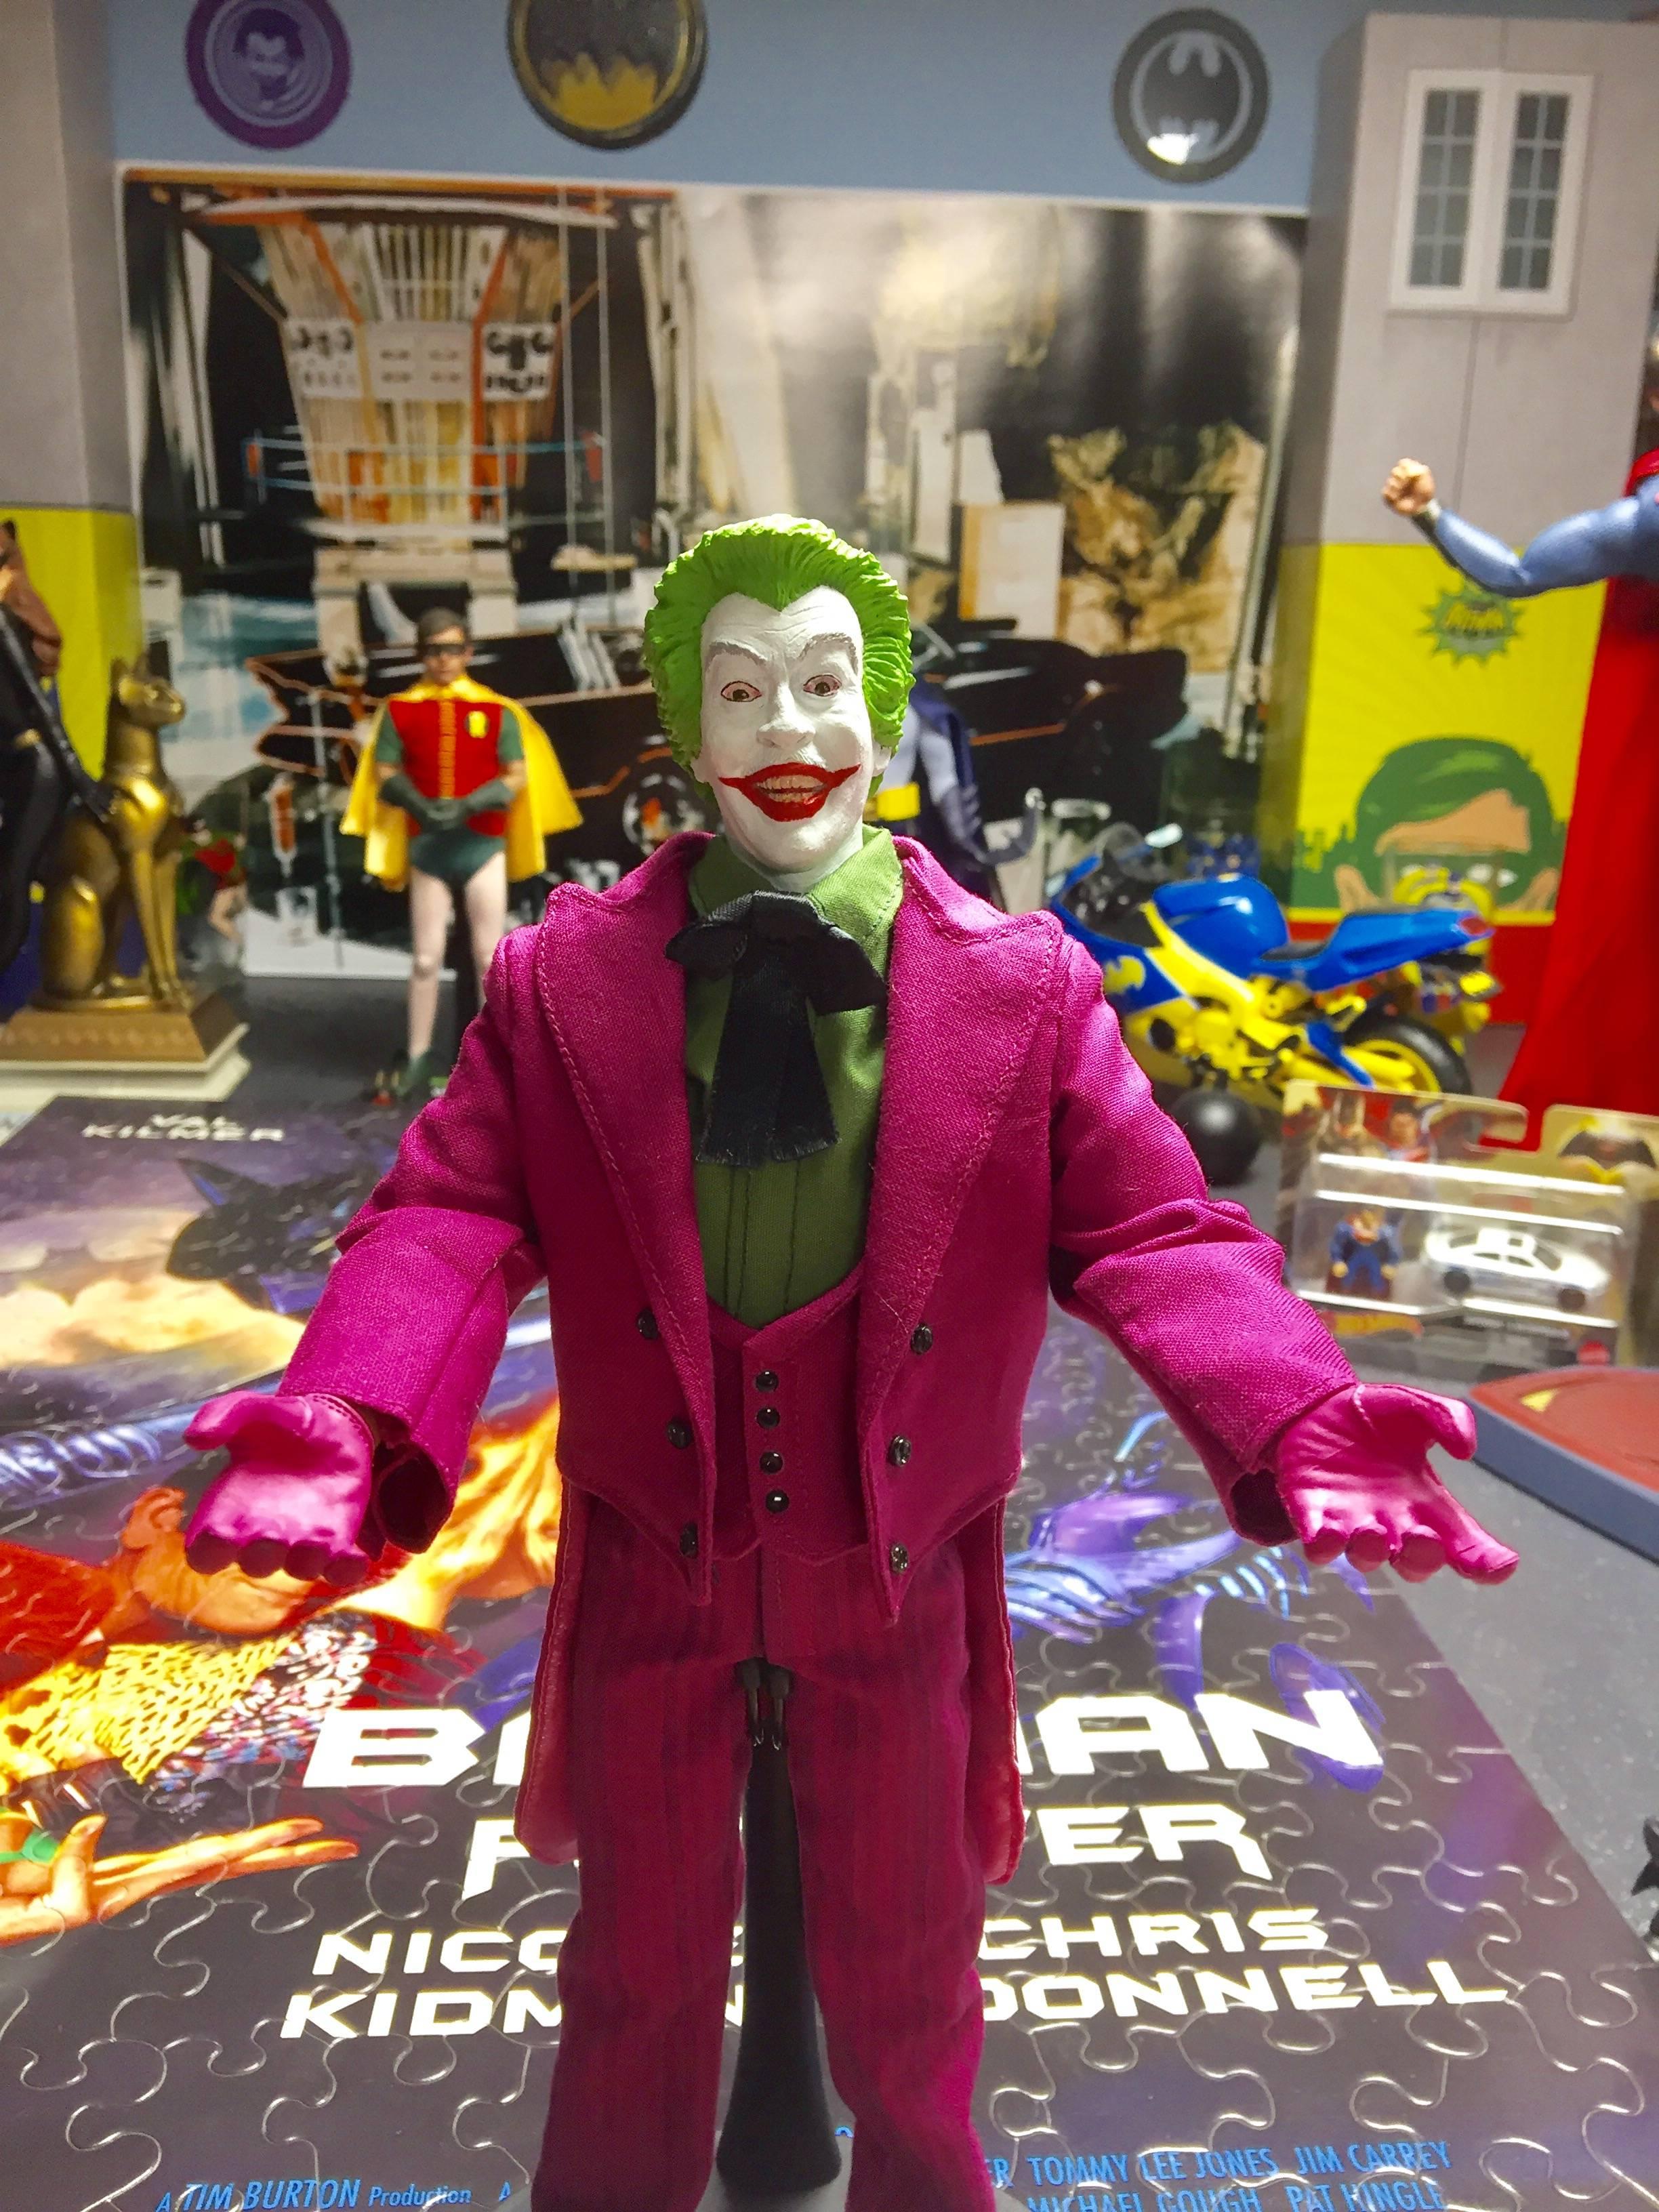 The Joker by Carl